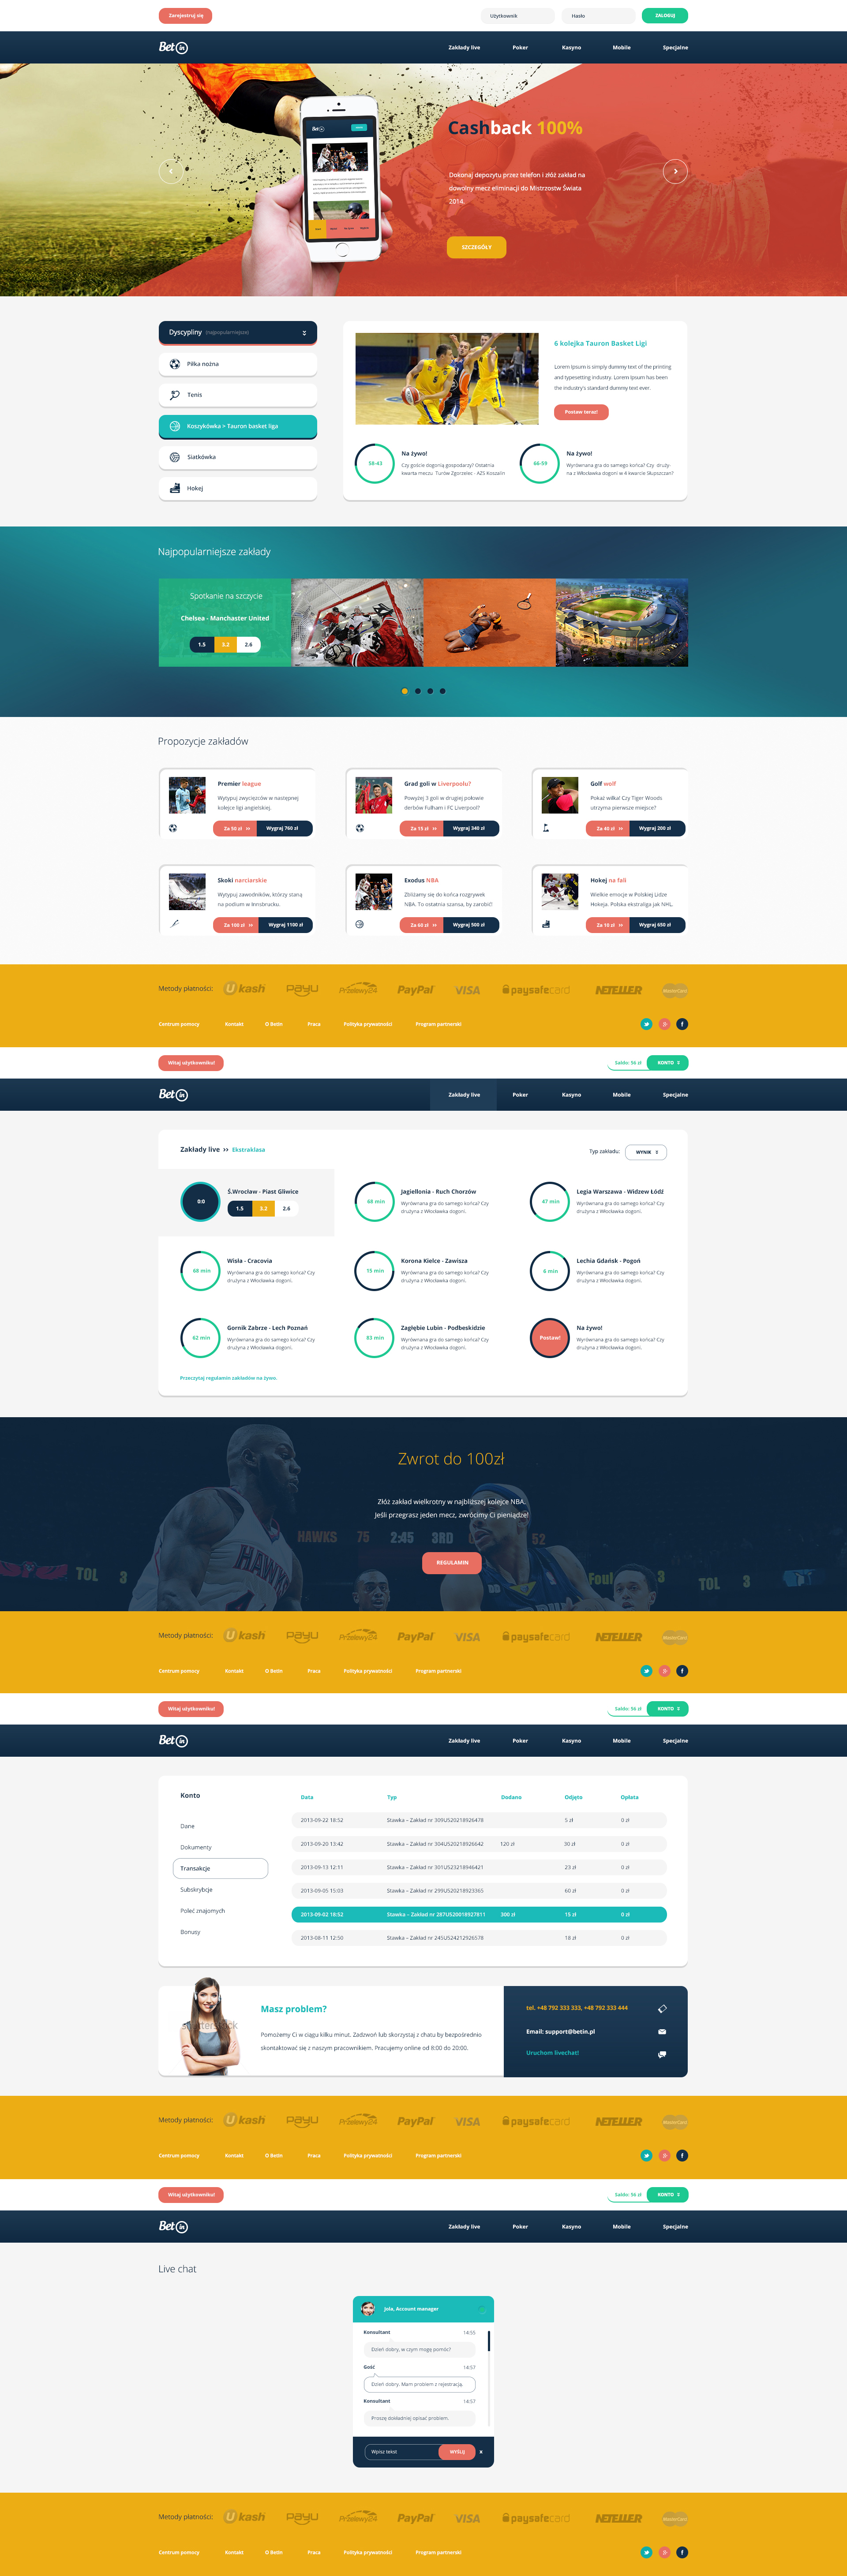 BetIn - web design for online betting/bookmaker